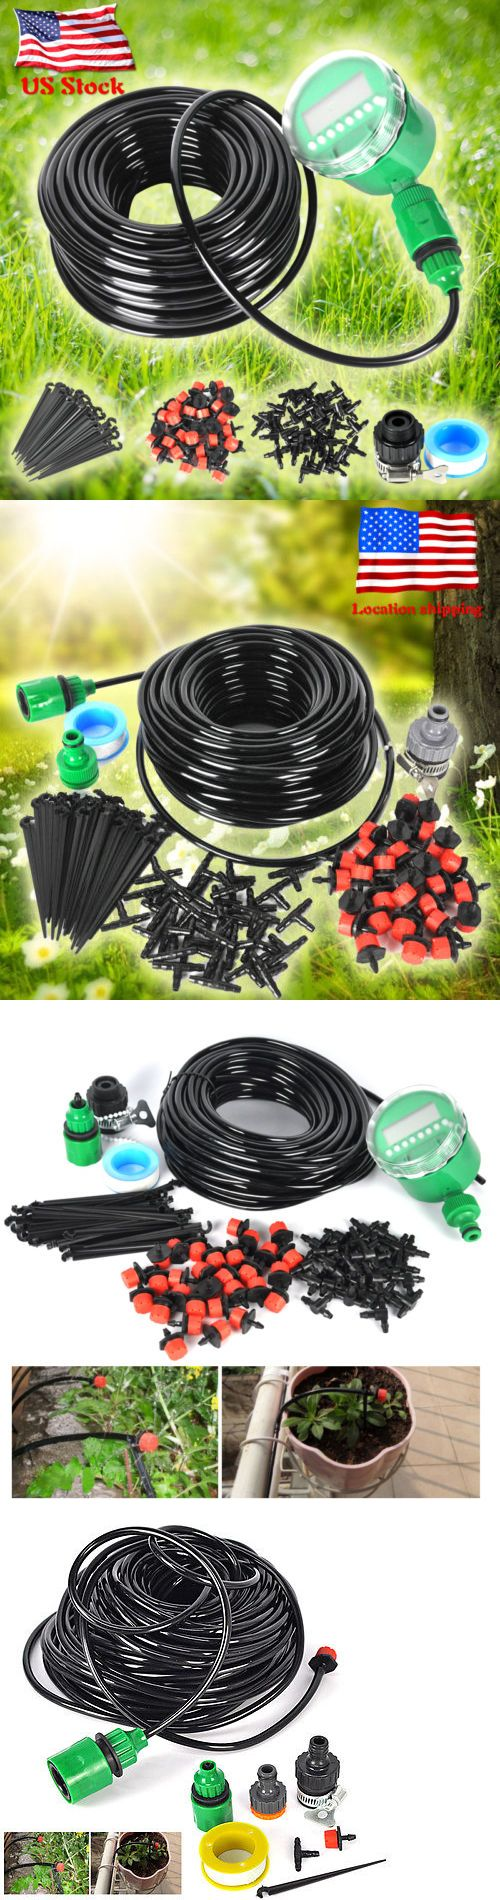 best 25 sprinkler hose ideas on pinterest hose box diy